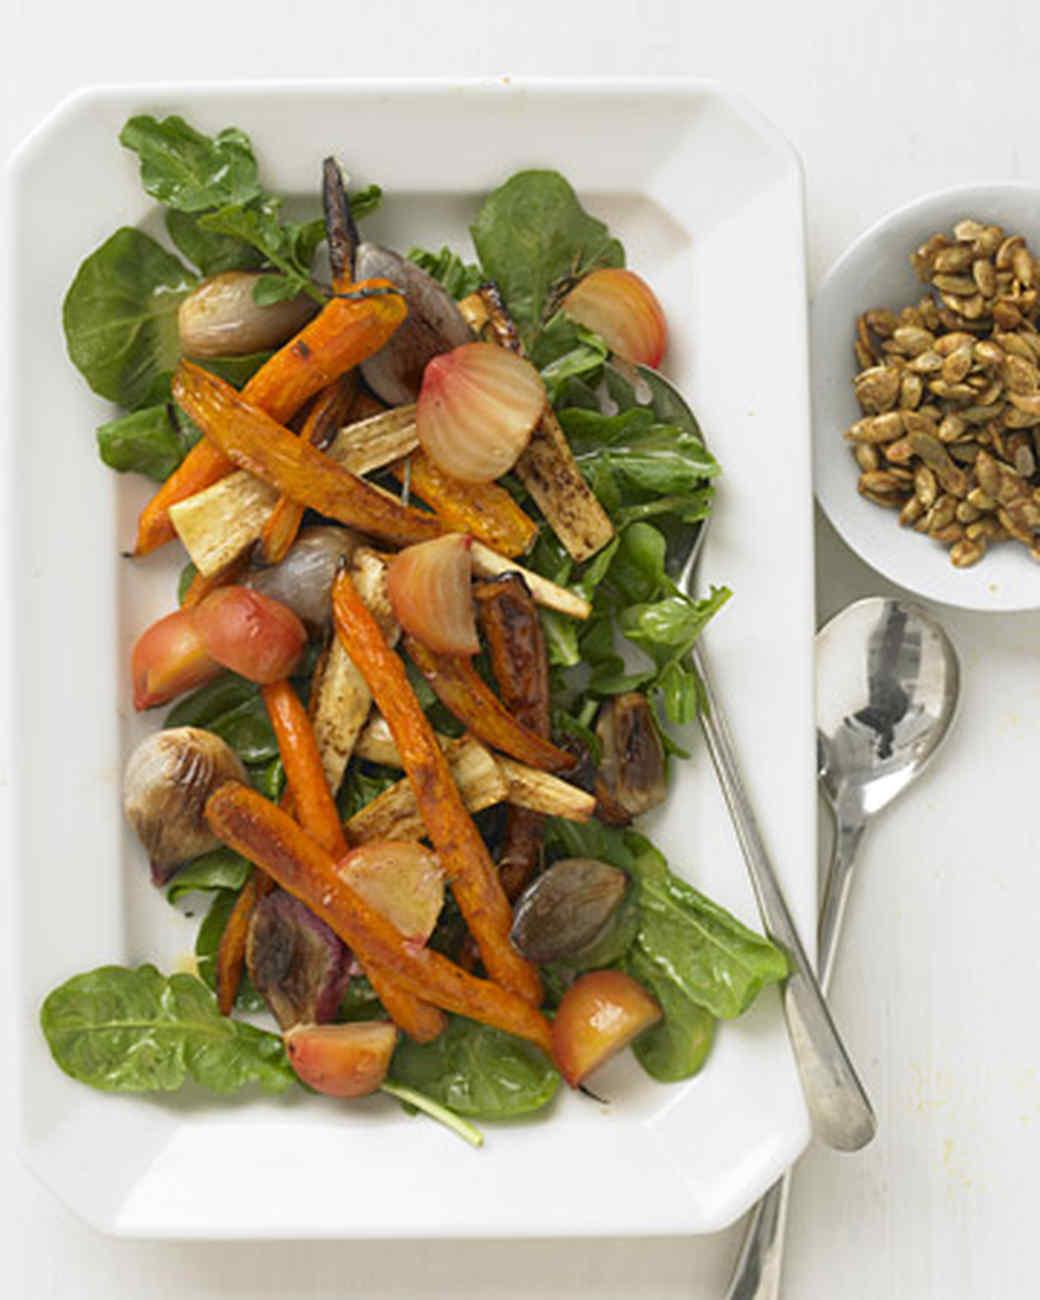 Shallot Vinaigrette For Roasted Autumn Harvest Salad